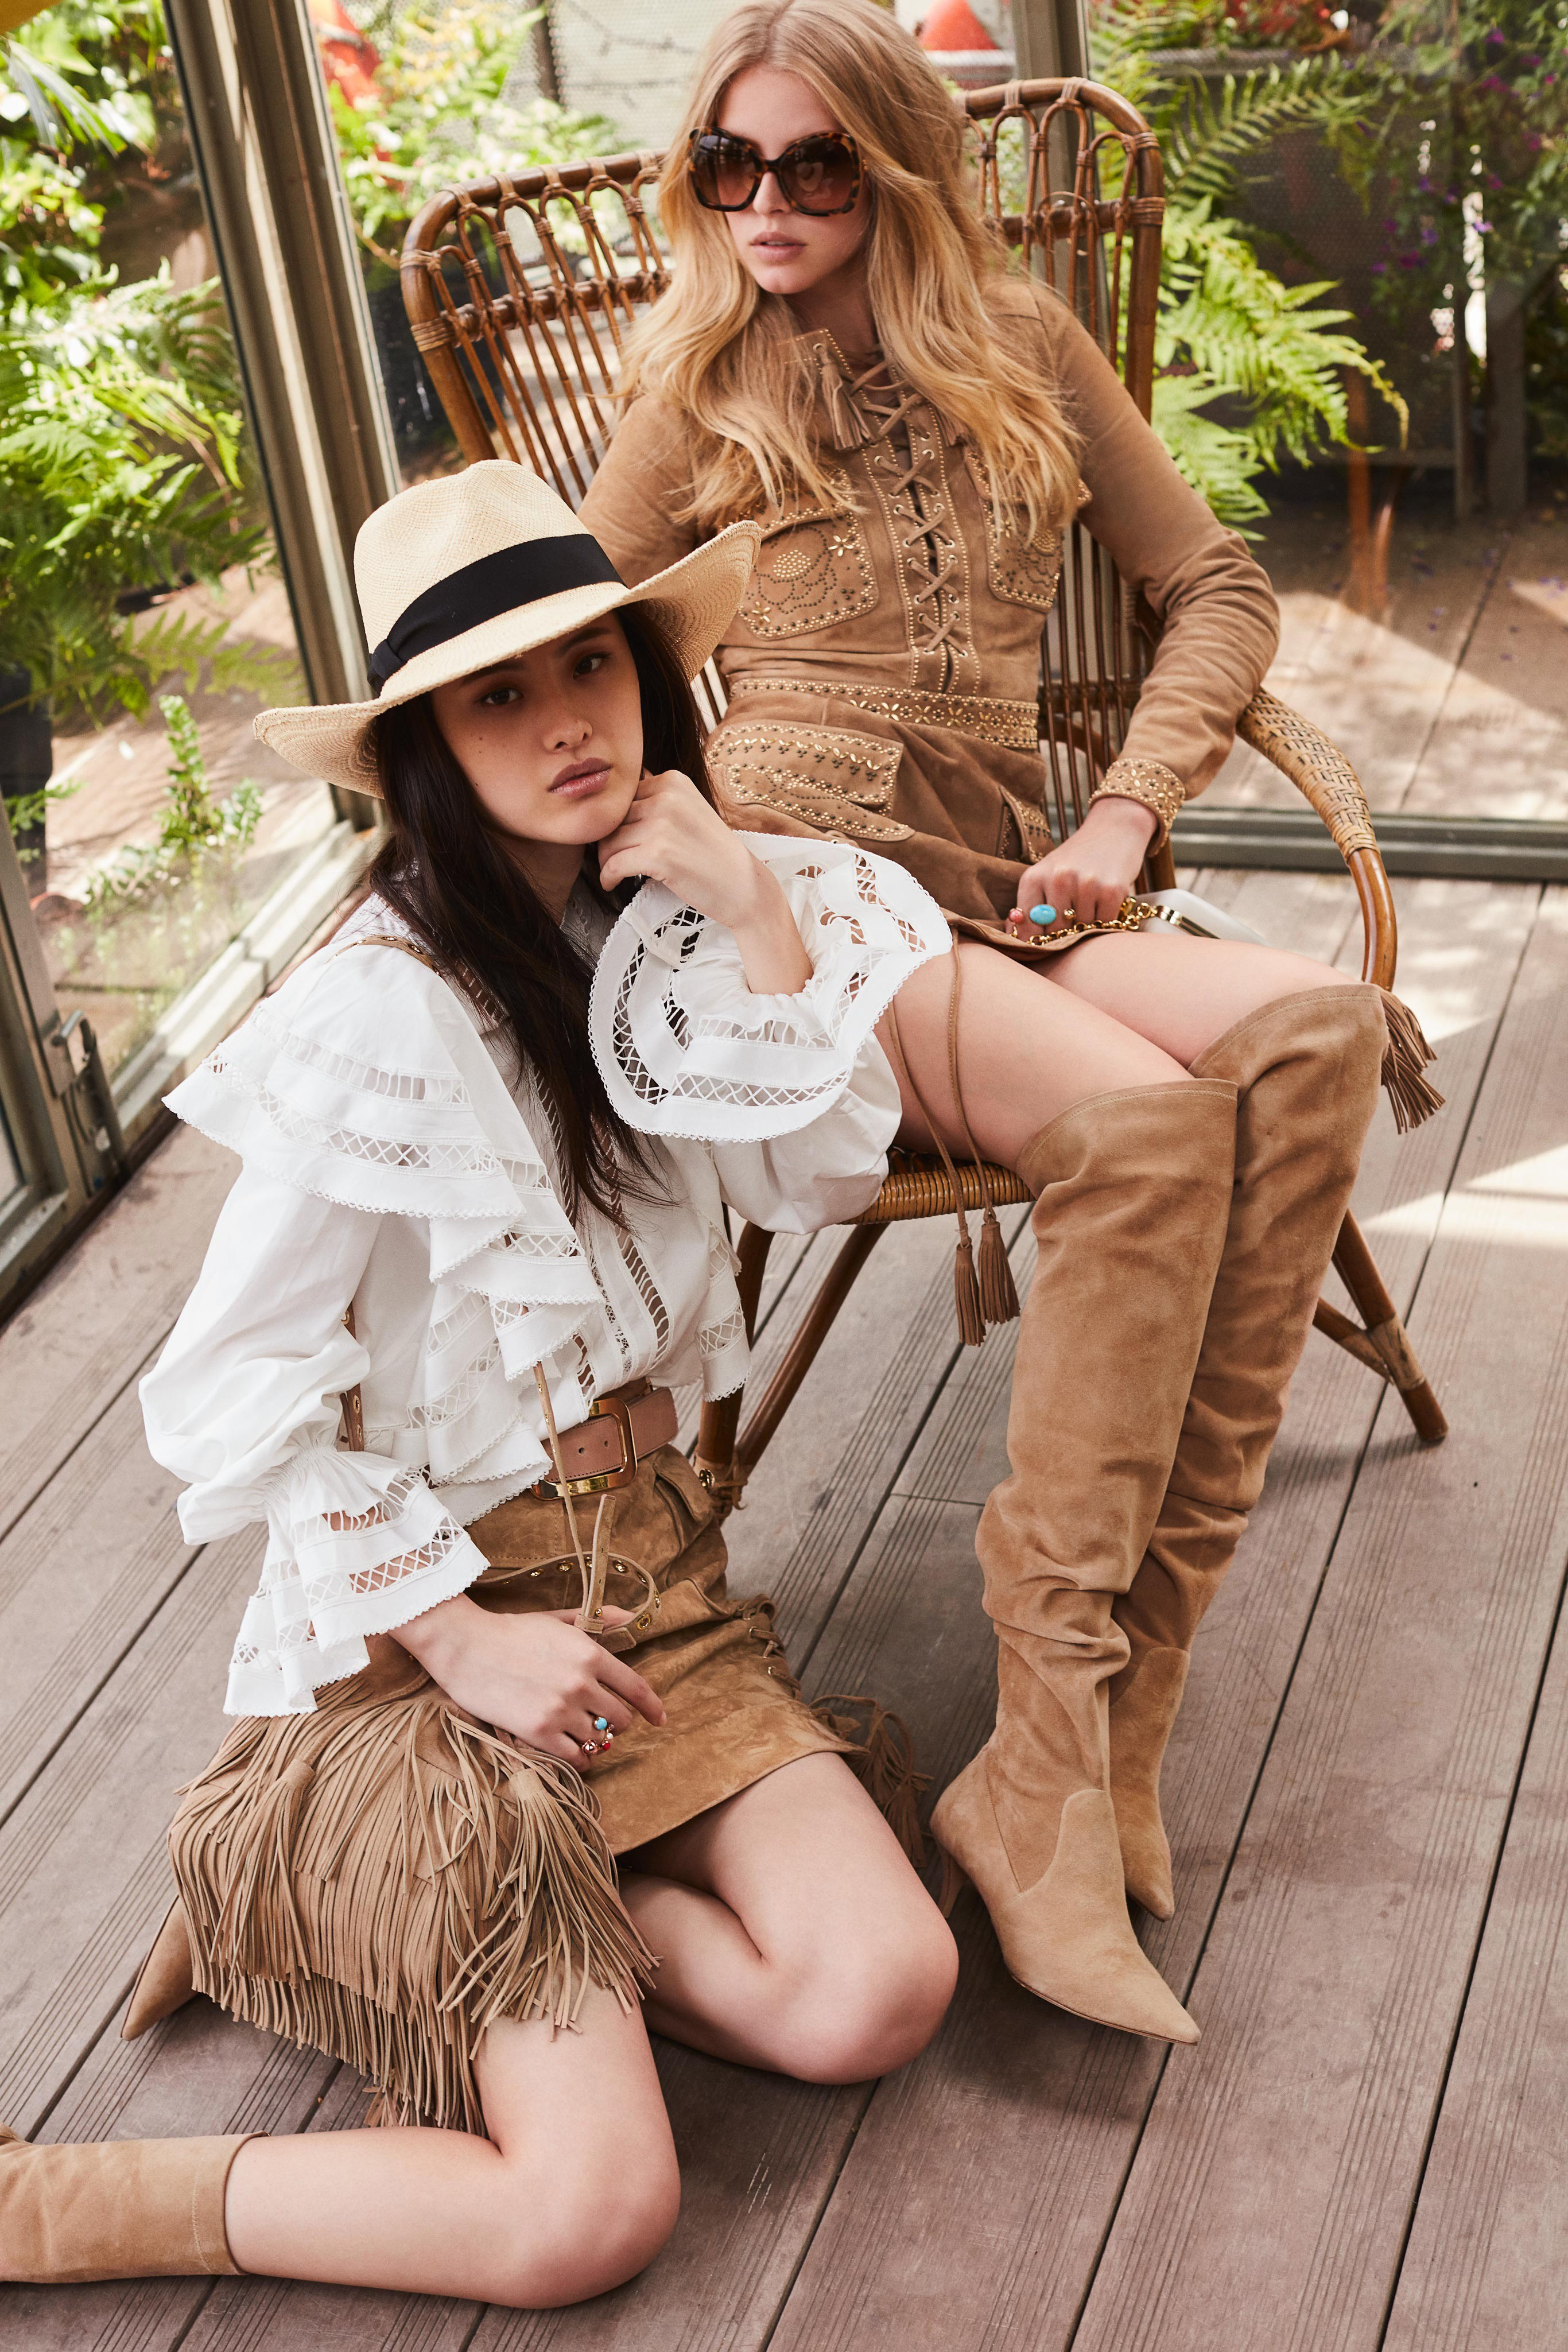 00007-Elie-Saab-Vogue-Resort-2019-pr